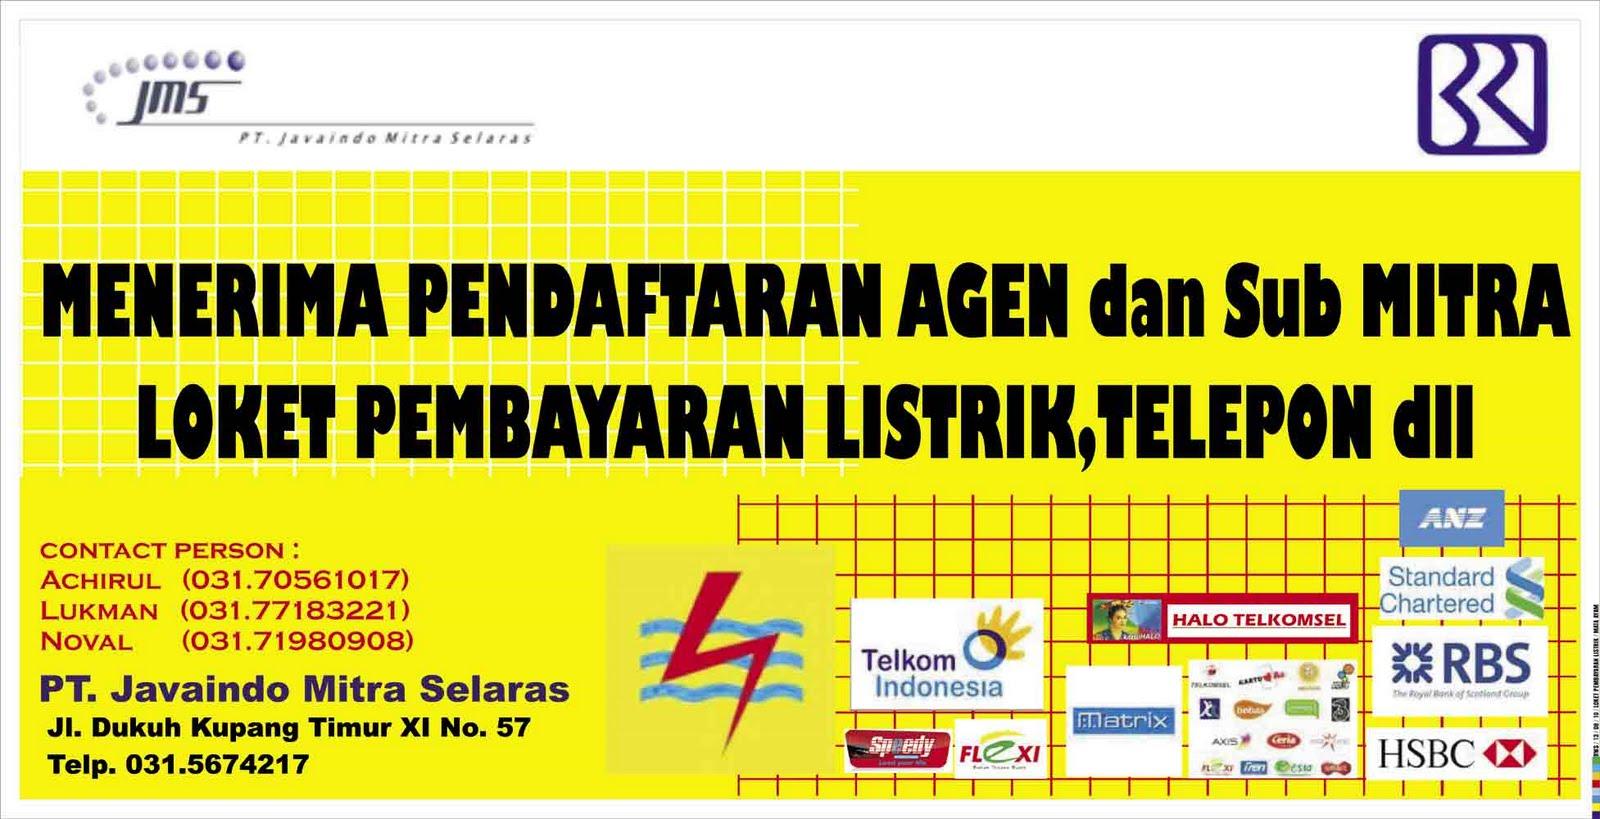 smart advertising: Spanduk Loket Pembayaran Listrik